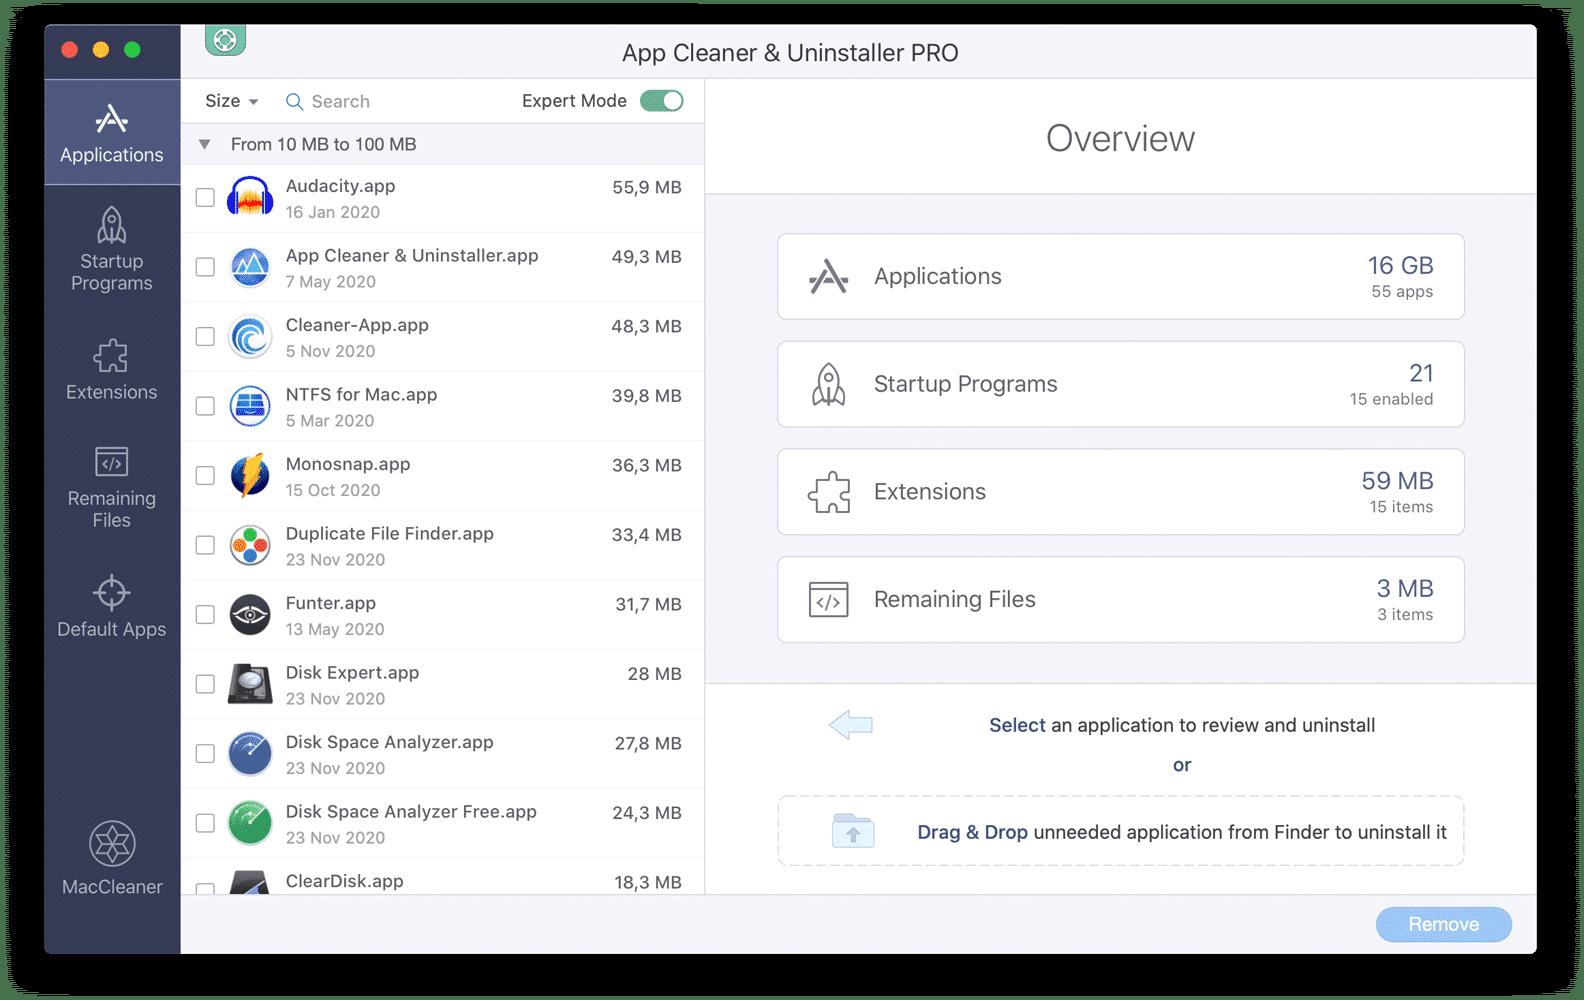 App Cleaner & Uninstaller application showing Overview window